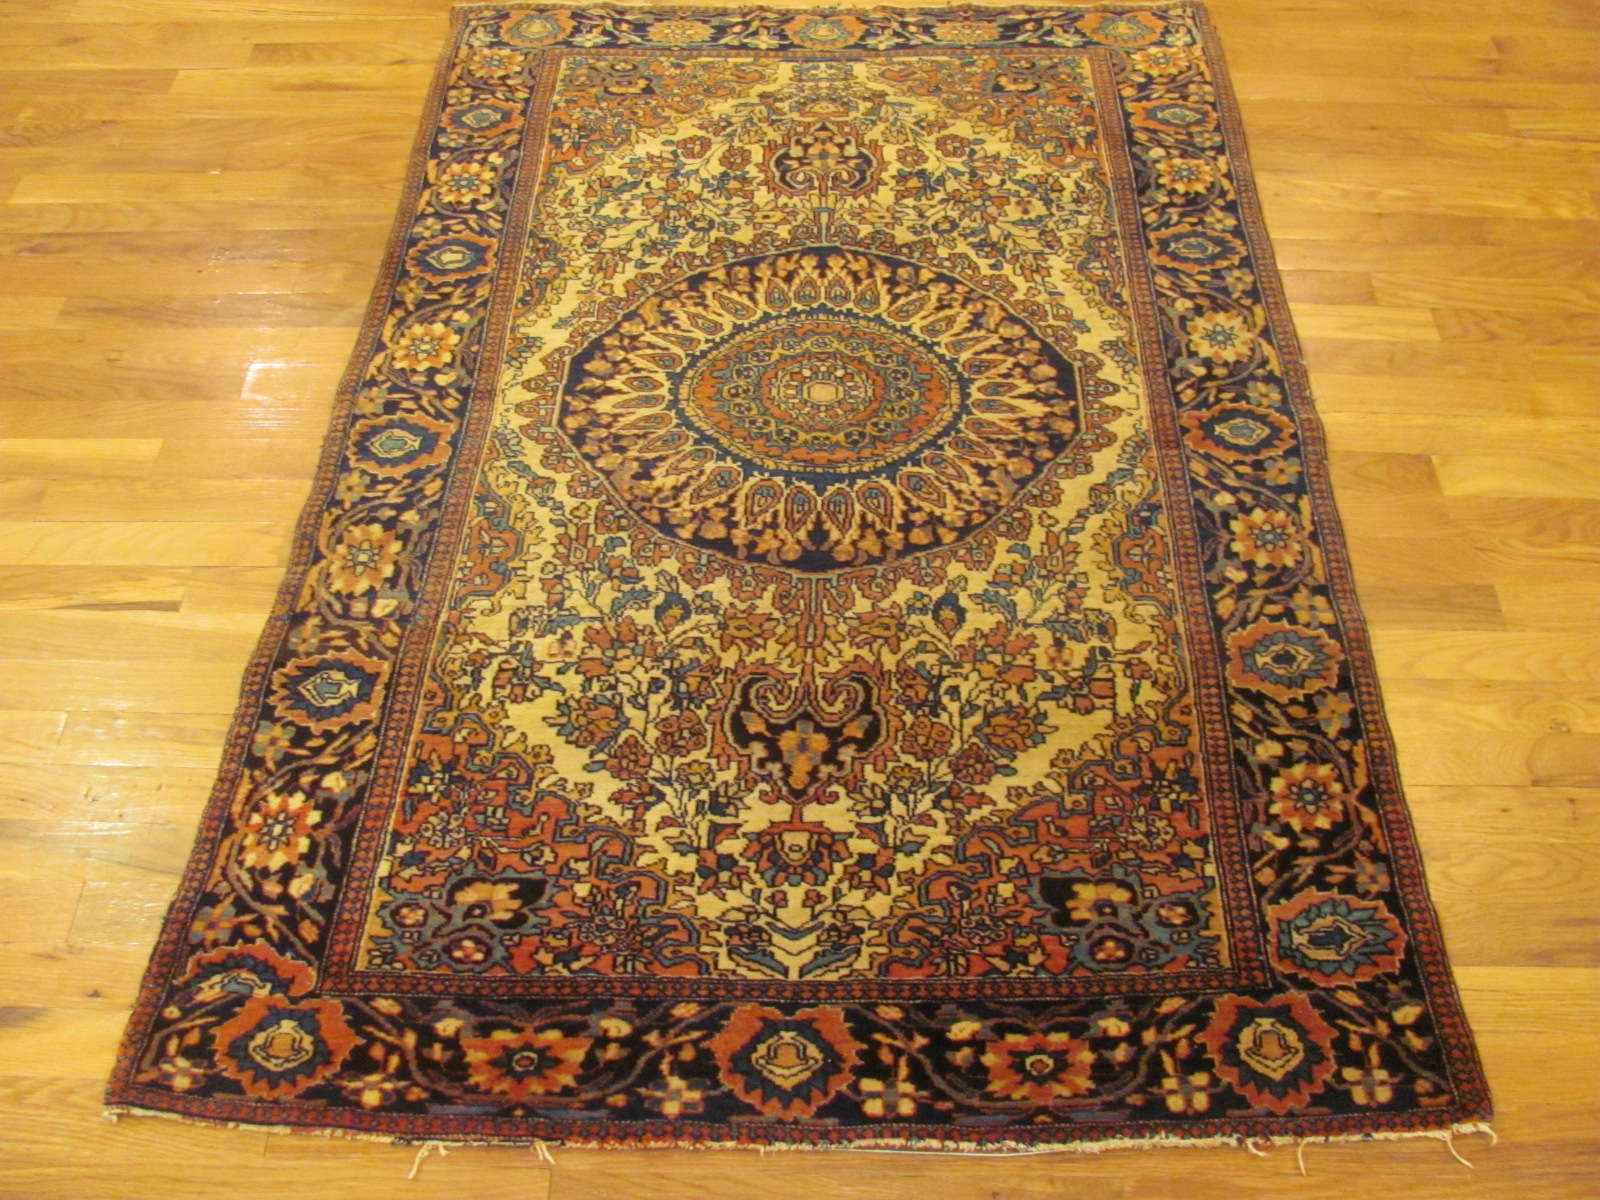 25092 antique persian fereghan rug 3,5x5,4